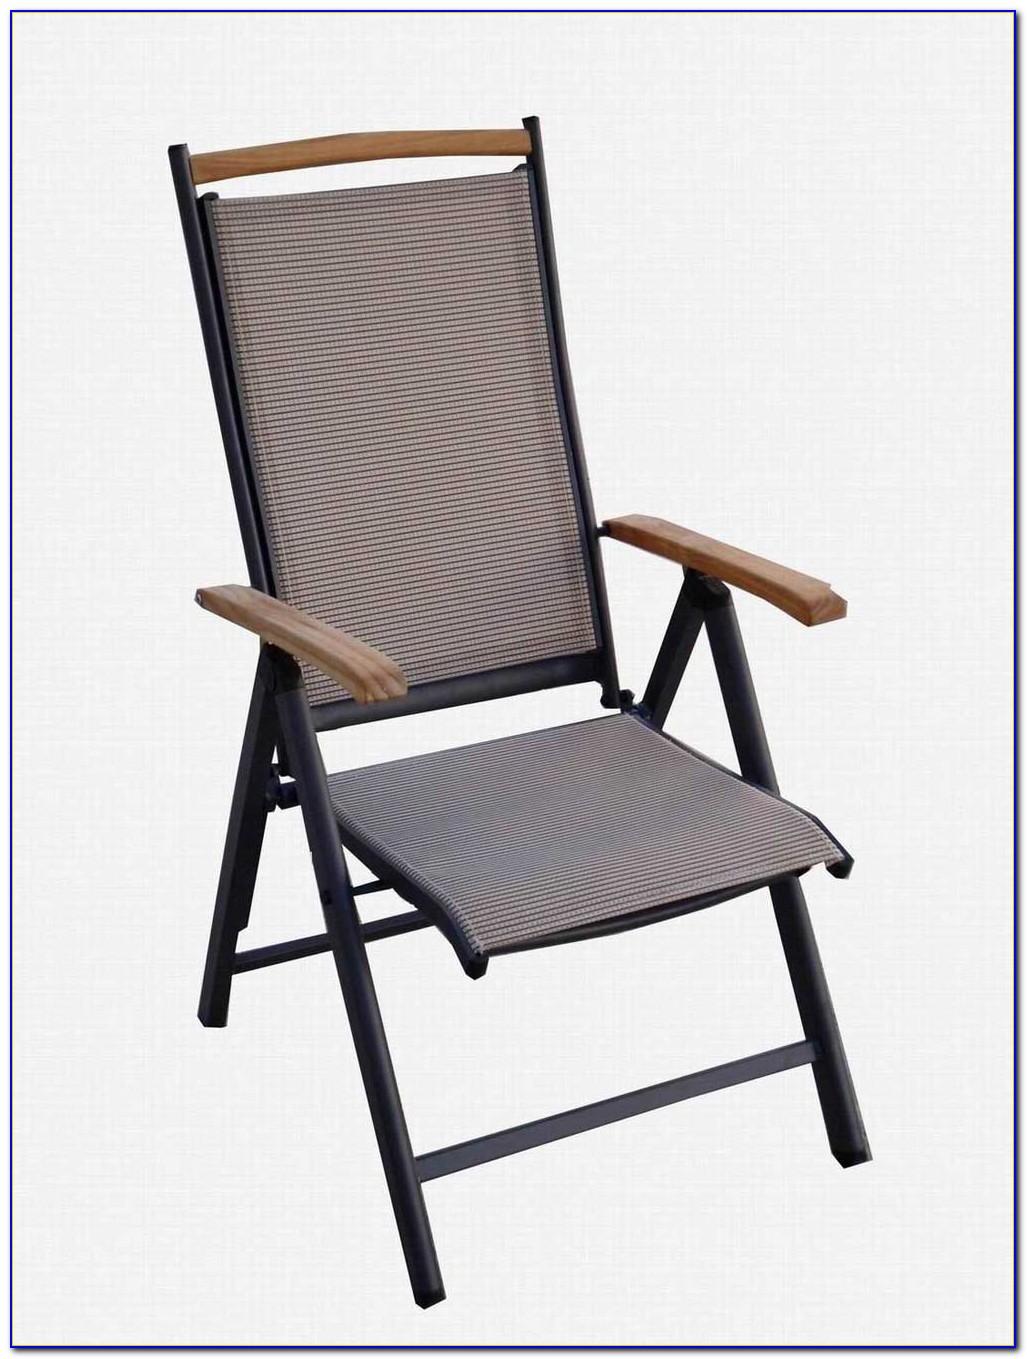 Aluminum Folding Lawn Chair Frames